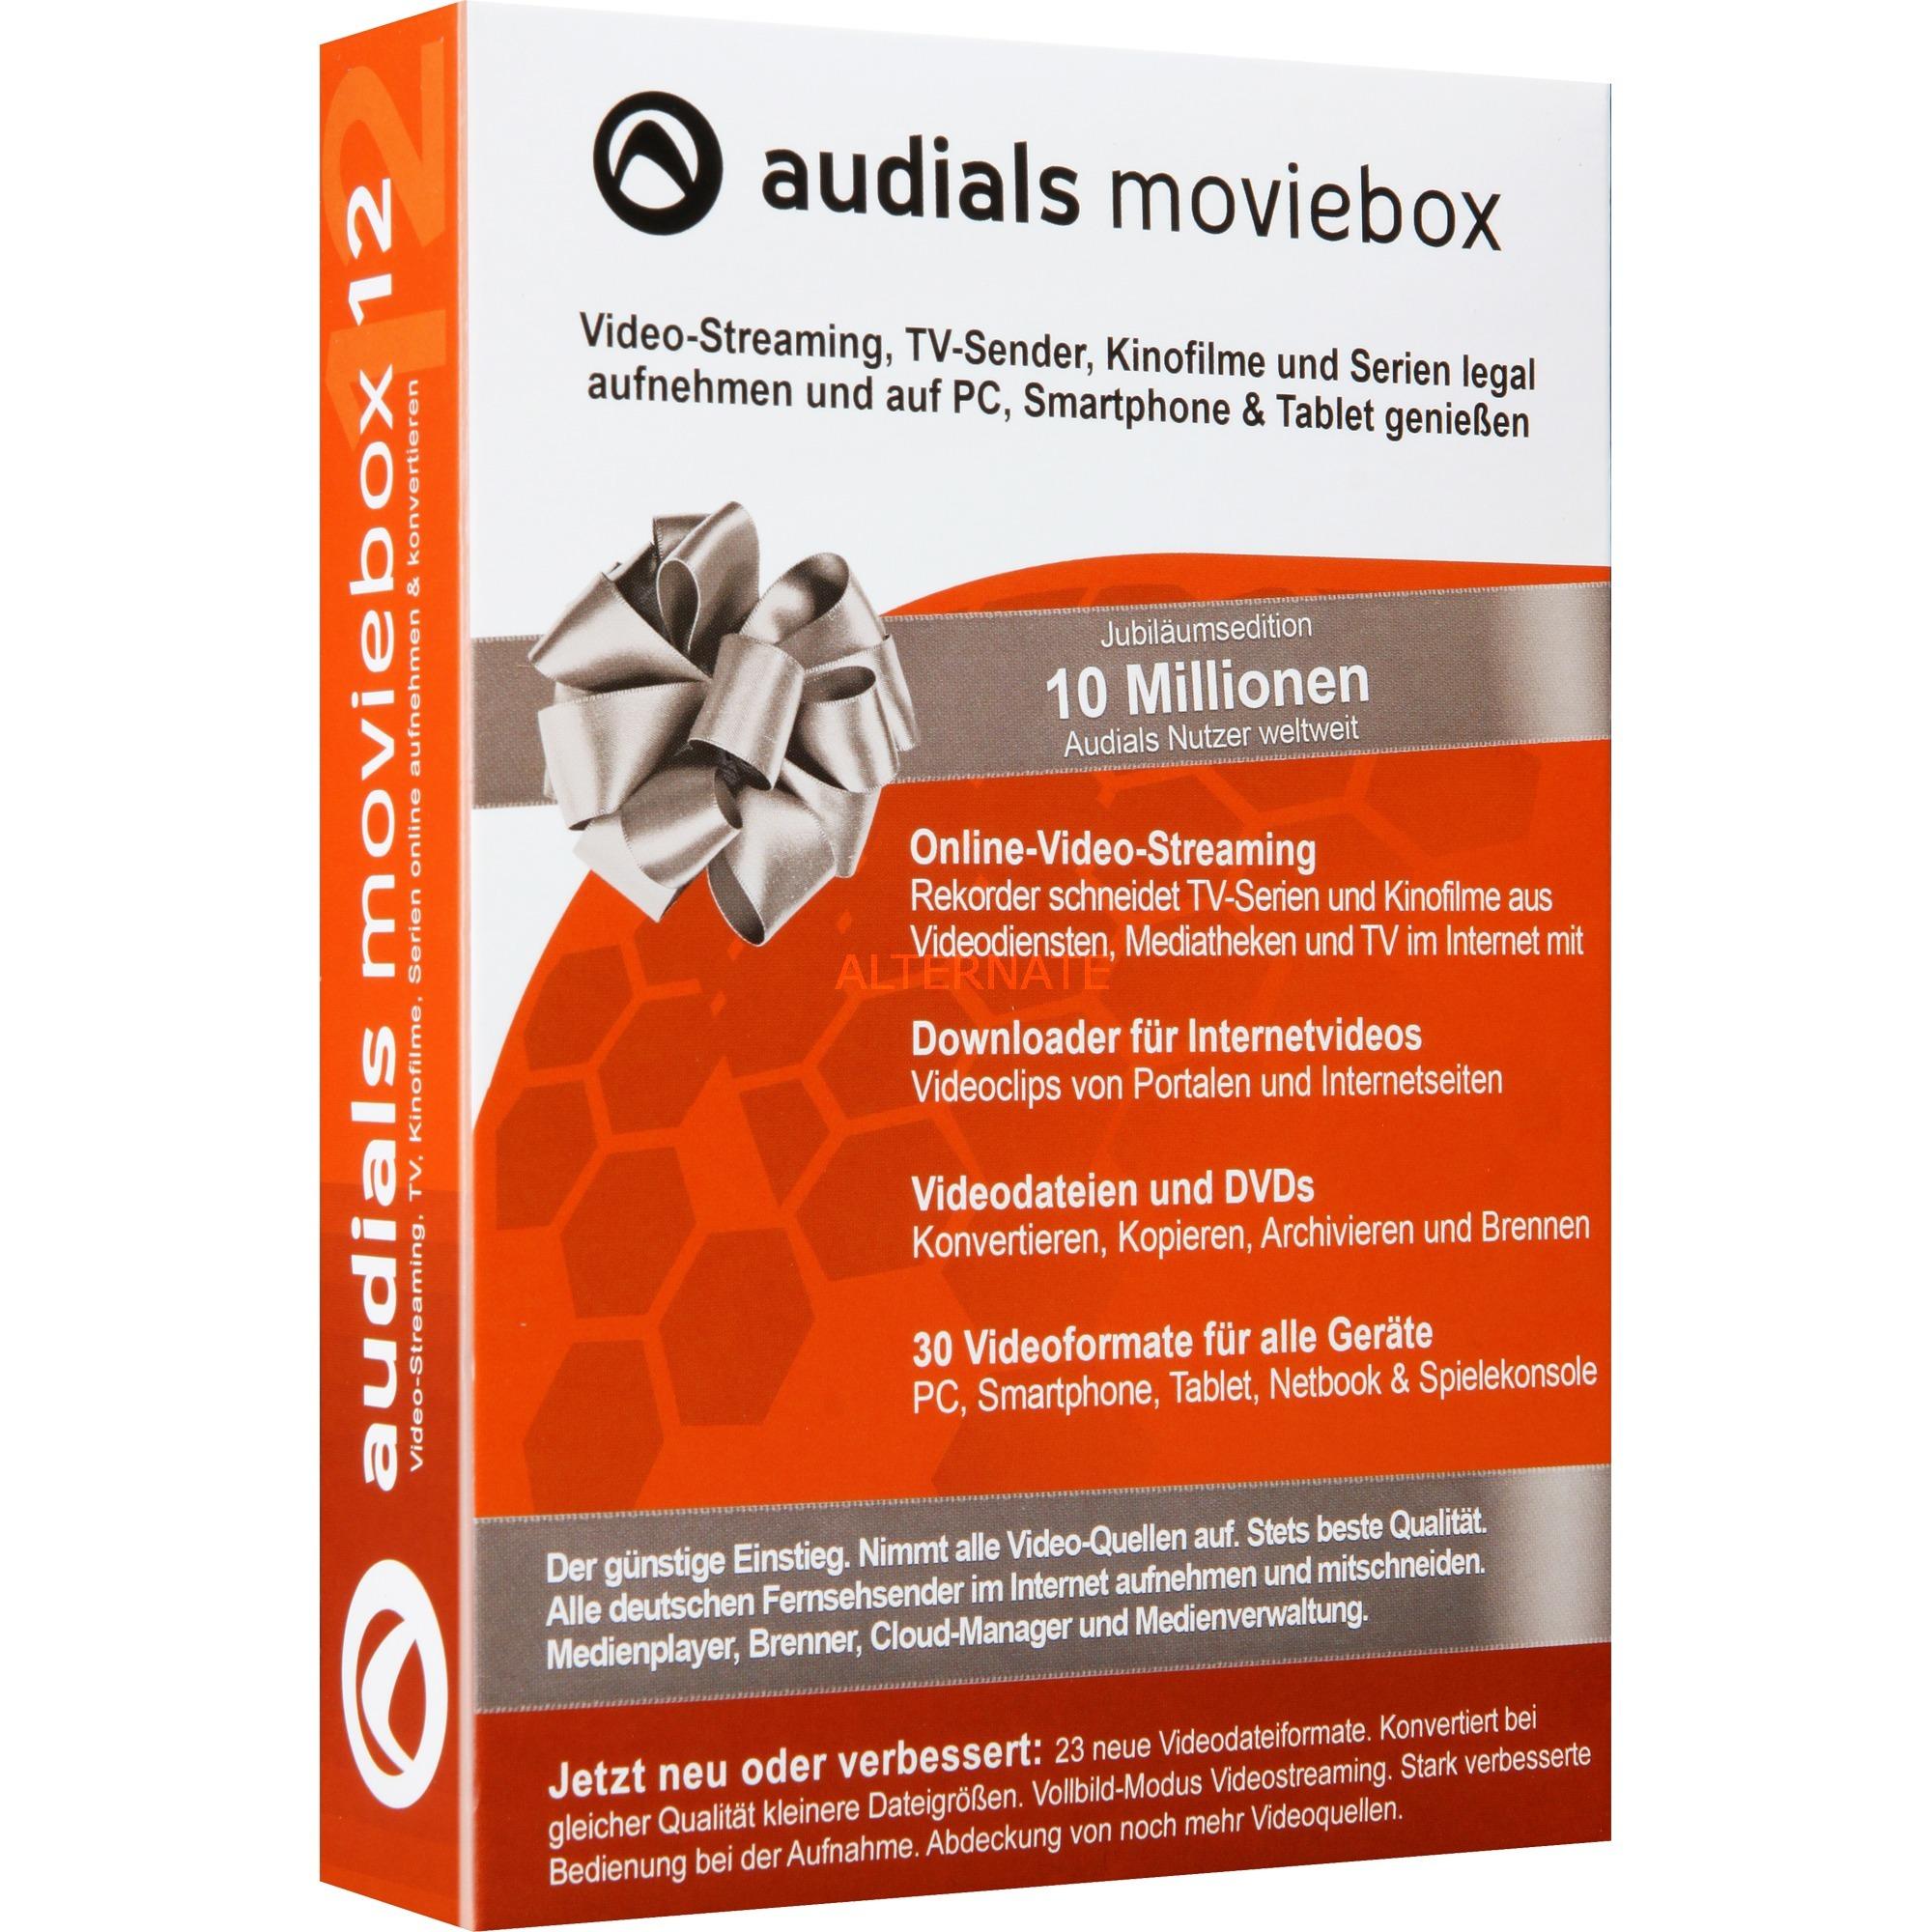 audials-moviebox-12-software